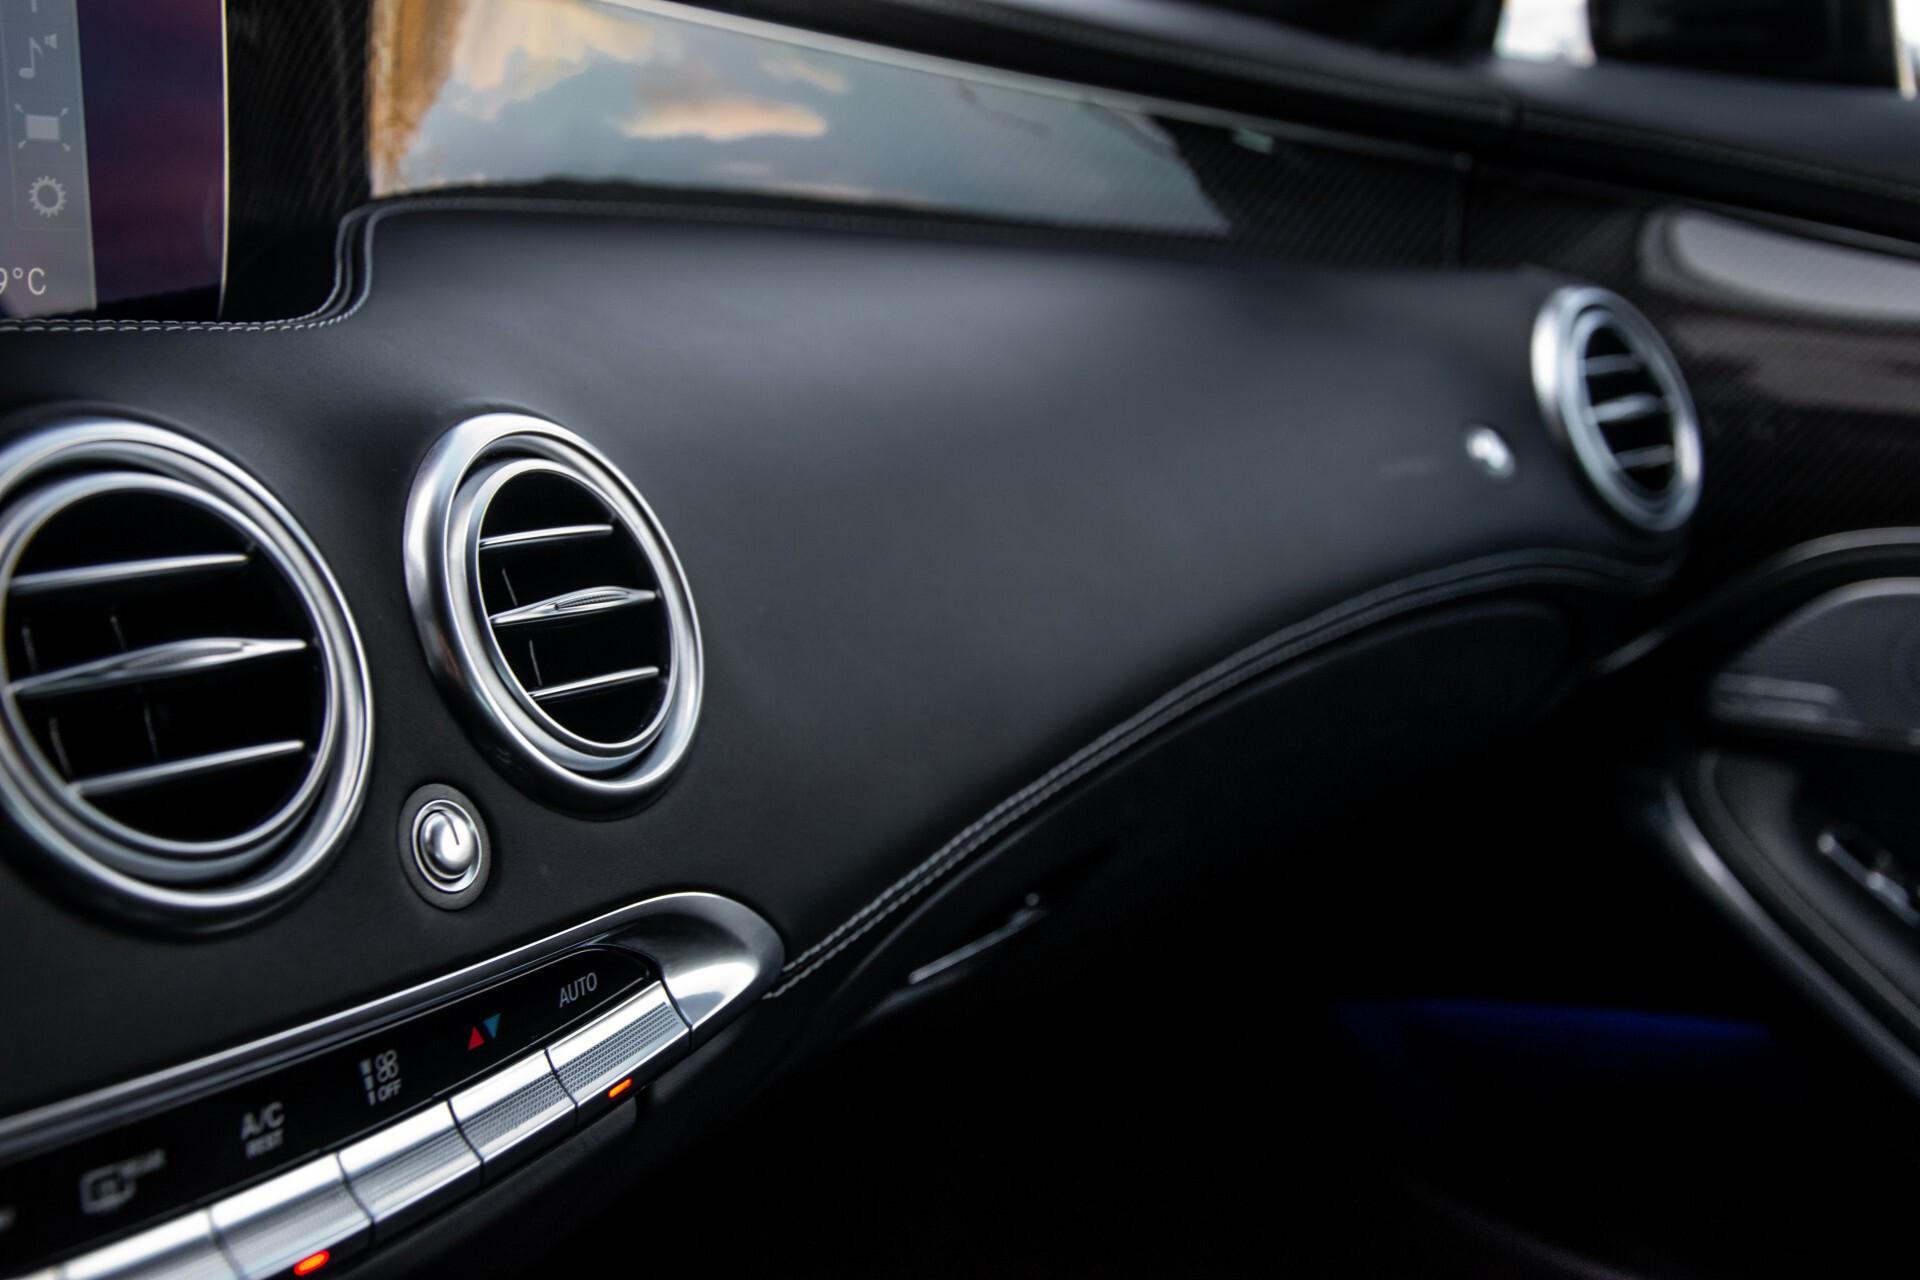 Mercedes-Benz S-Klasse Cabrio 63 AMG 4M+ Keramisch/Burmester High End 3D/Carbon/Driverspack/Blackpack Aut9 Foto 45